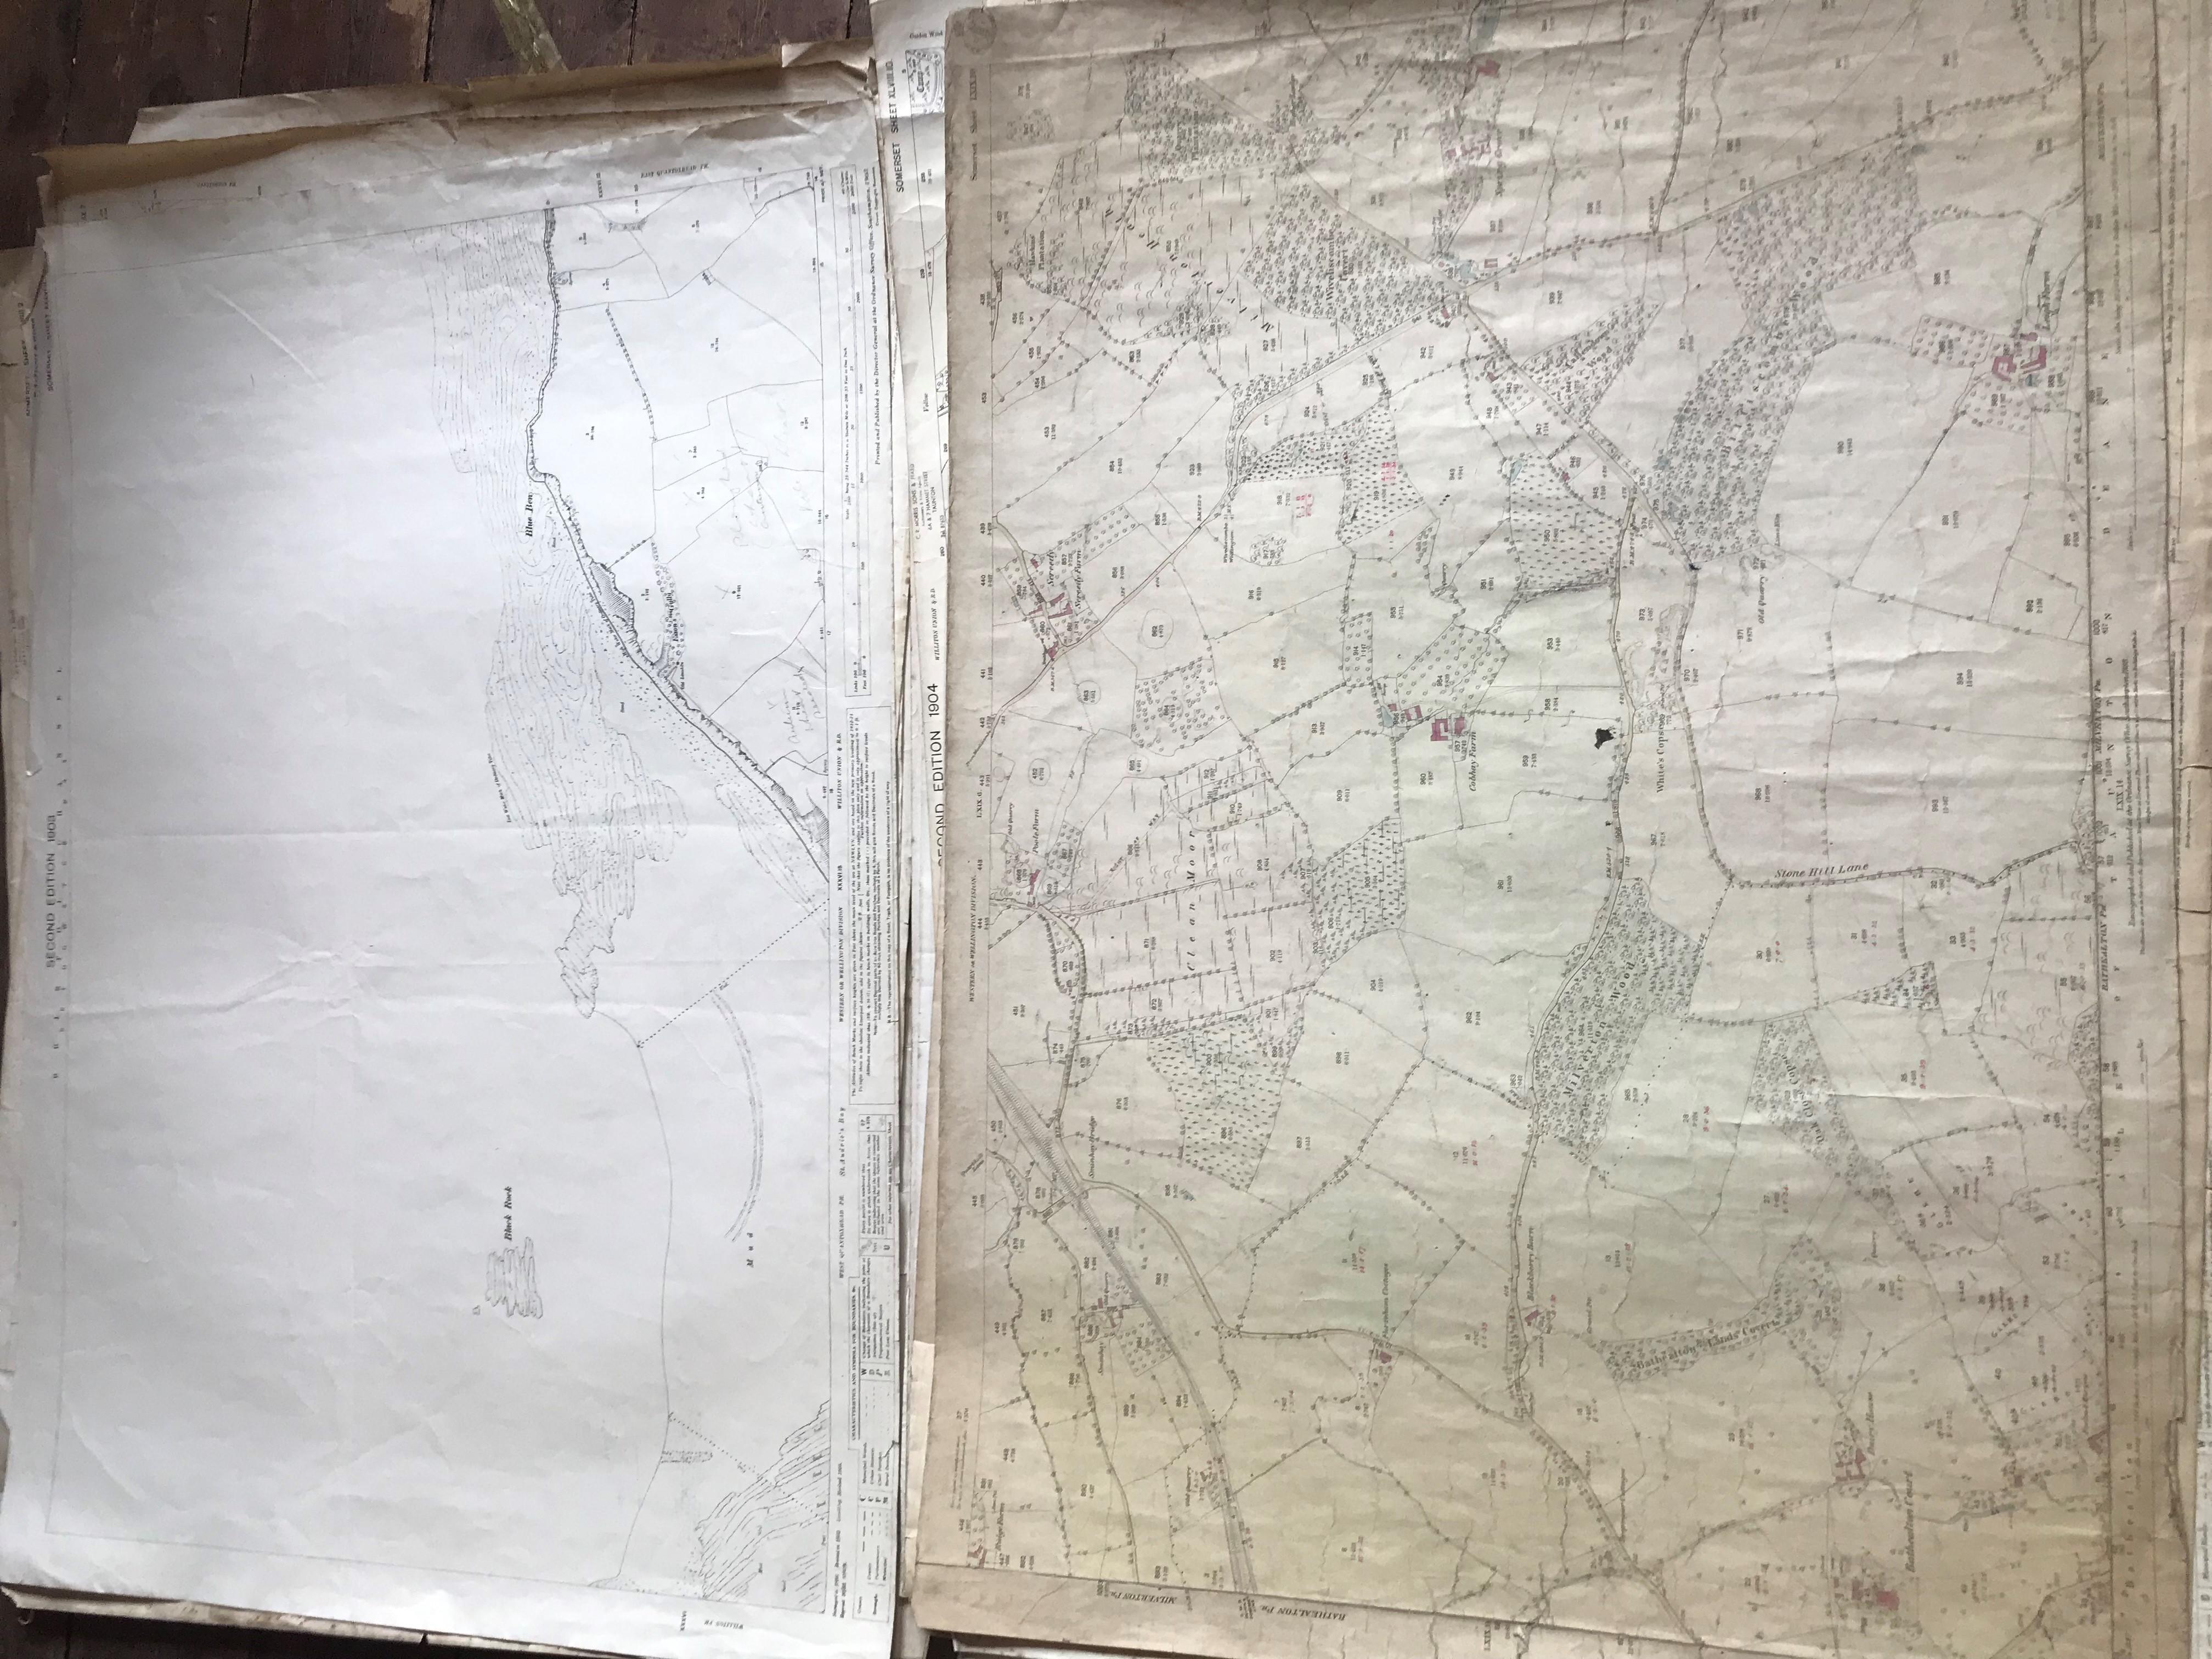 THIRTY 1:2500 ORDNANCE SURVEY MAPS featuring Chelston, Ham, Sampford Brett, Wellington, - Image 2 of 16